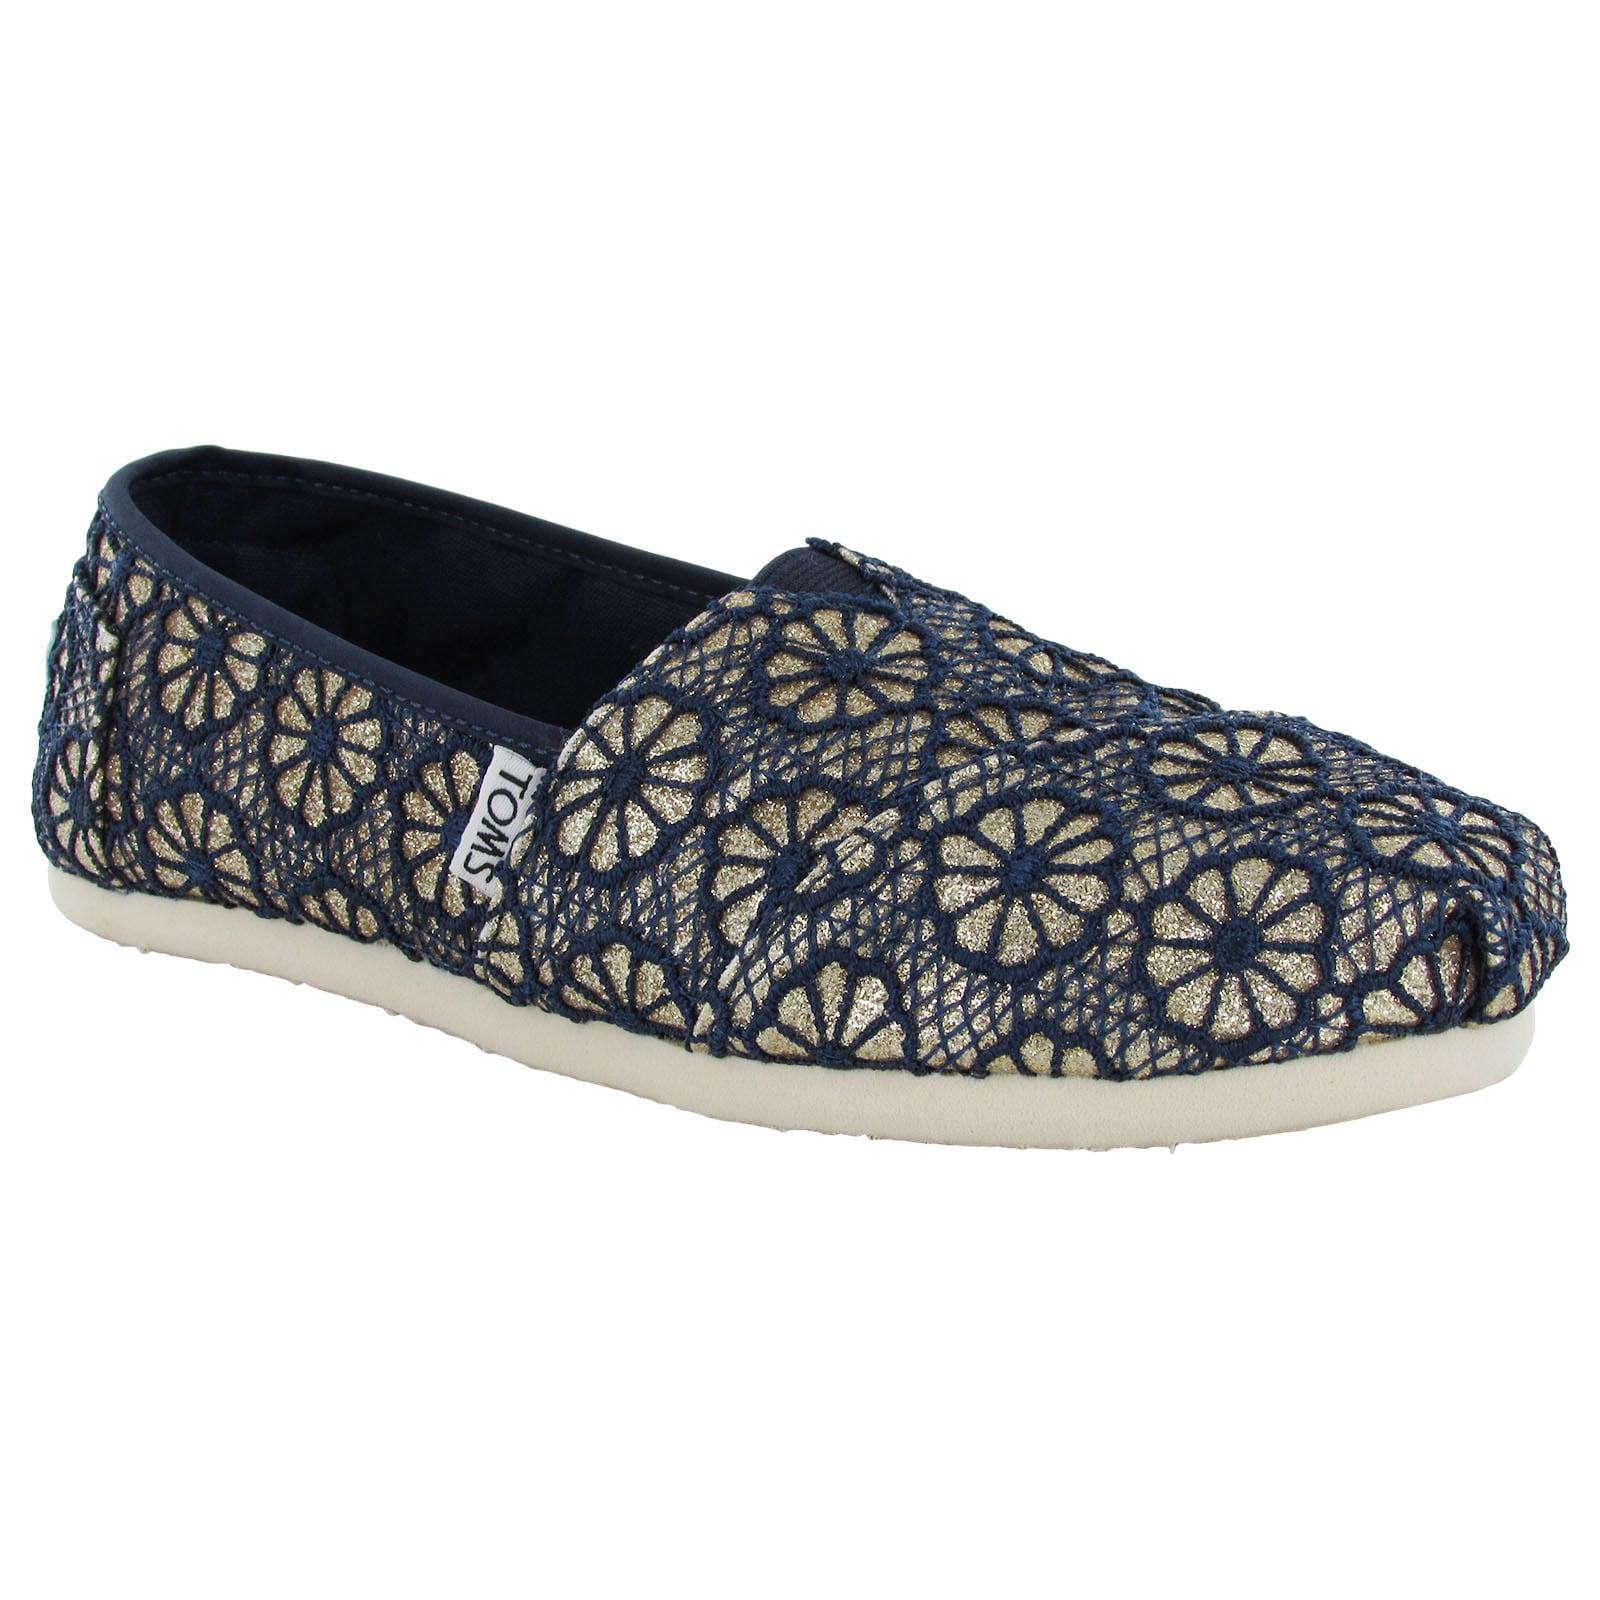 Toms Women's Crochet Glitter Slip On Alpargata Flat Shoes...